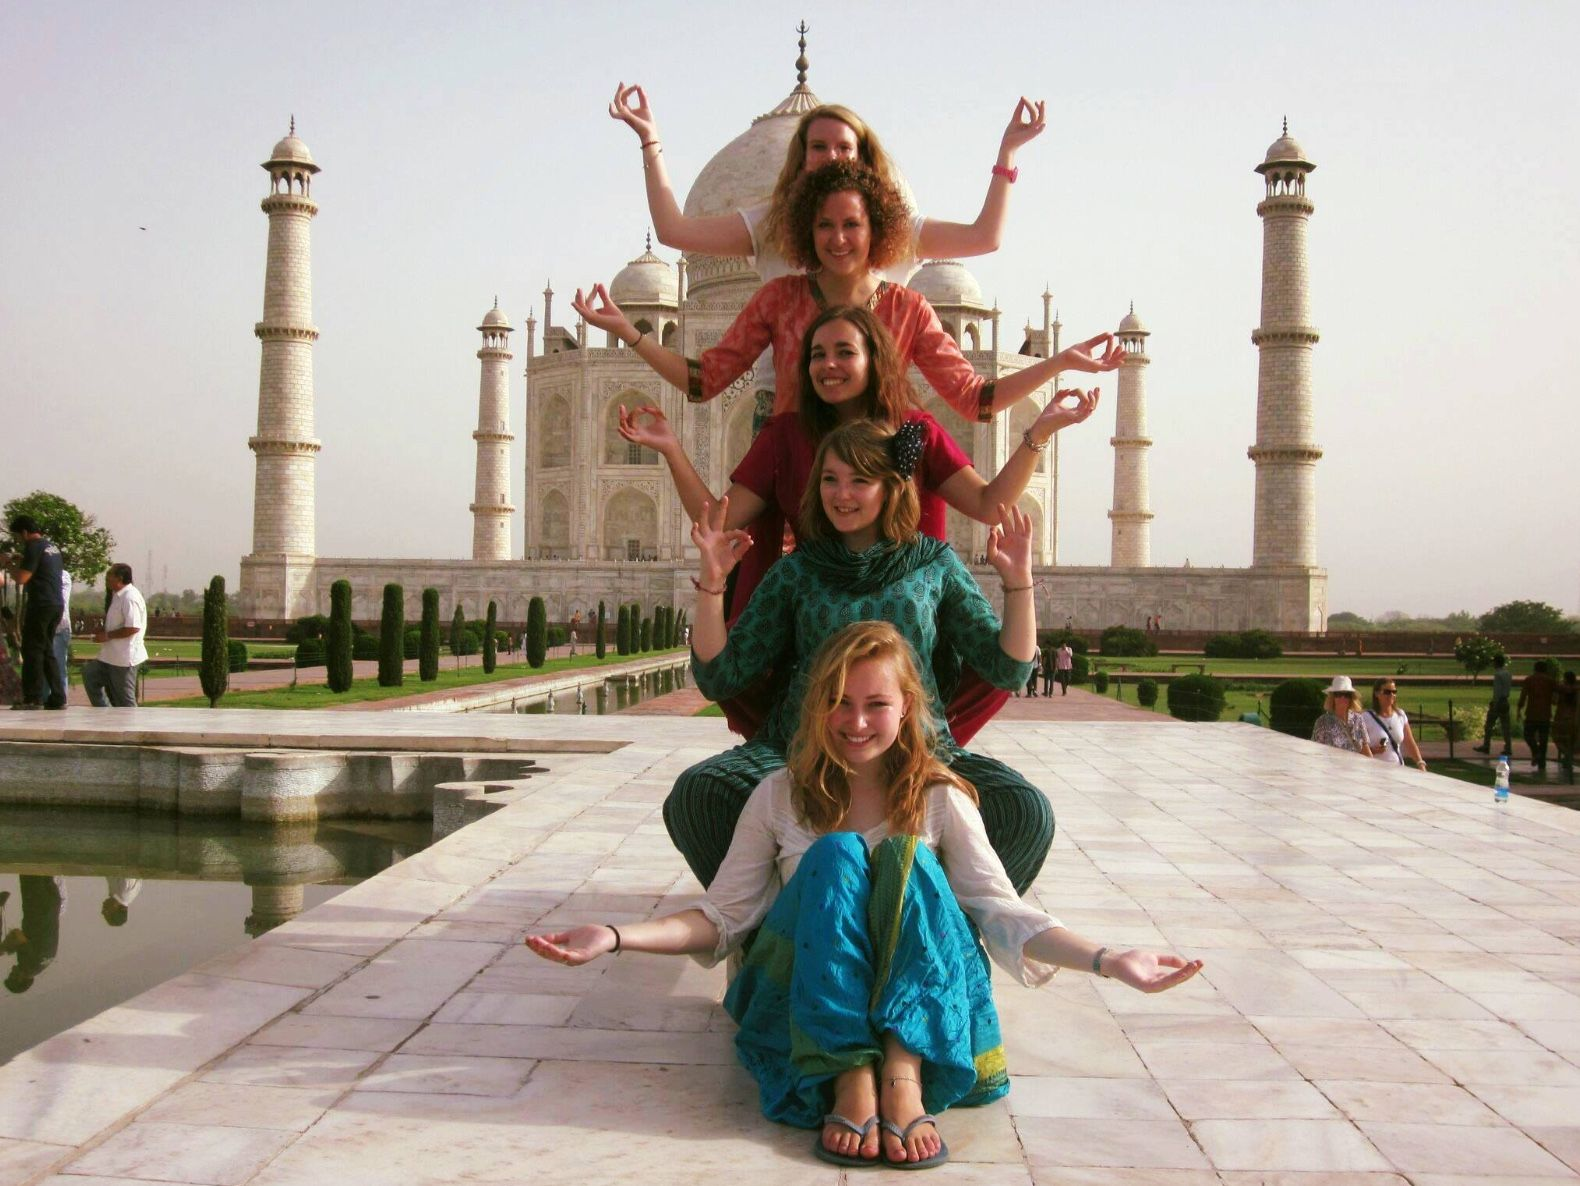 Taj Mahal - 10 things to do in India